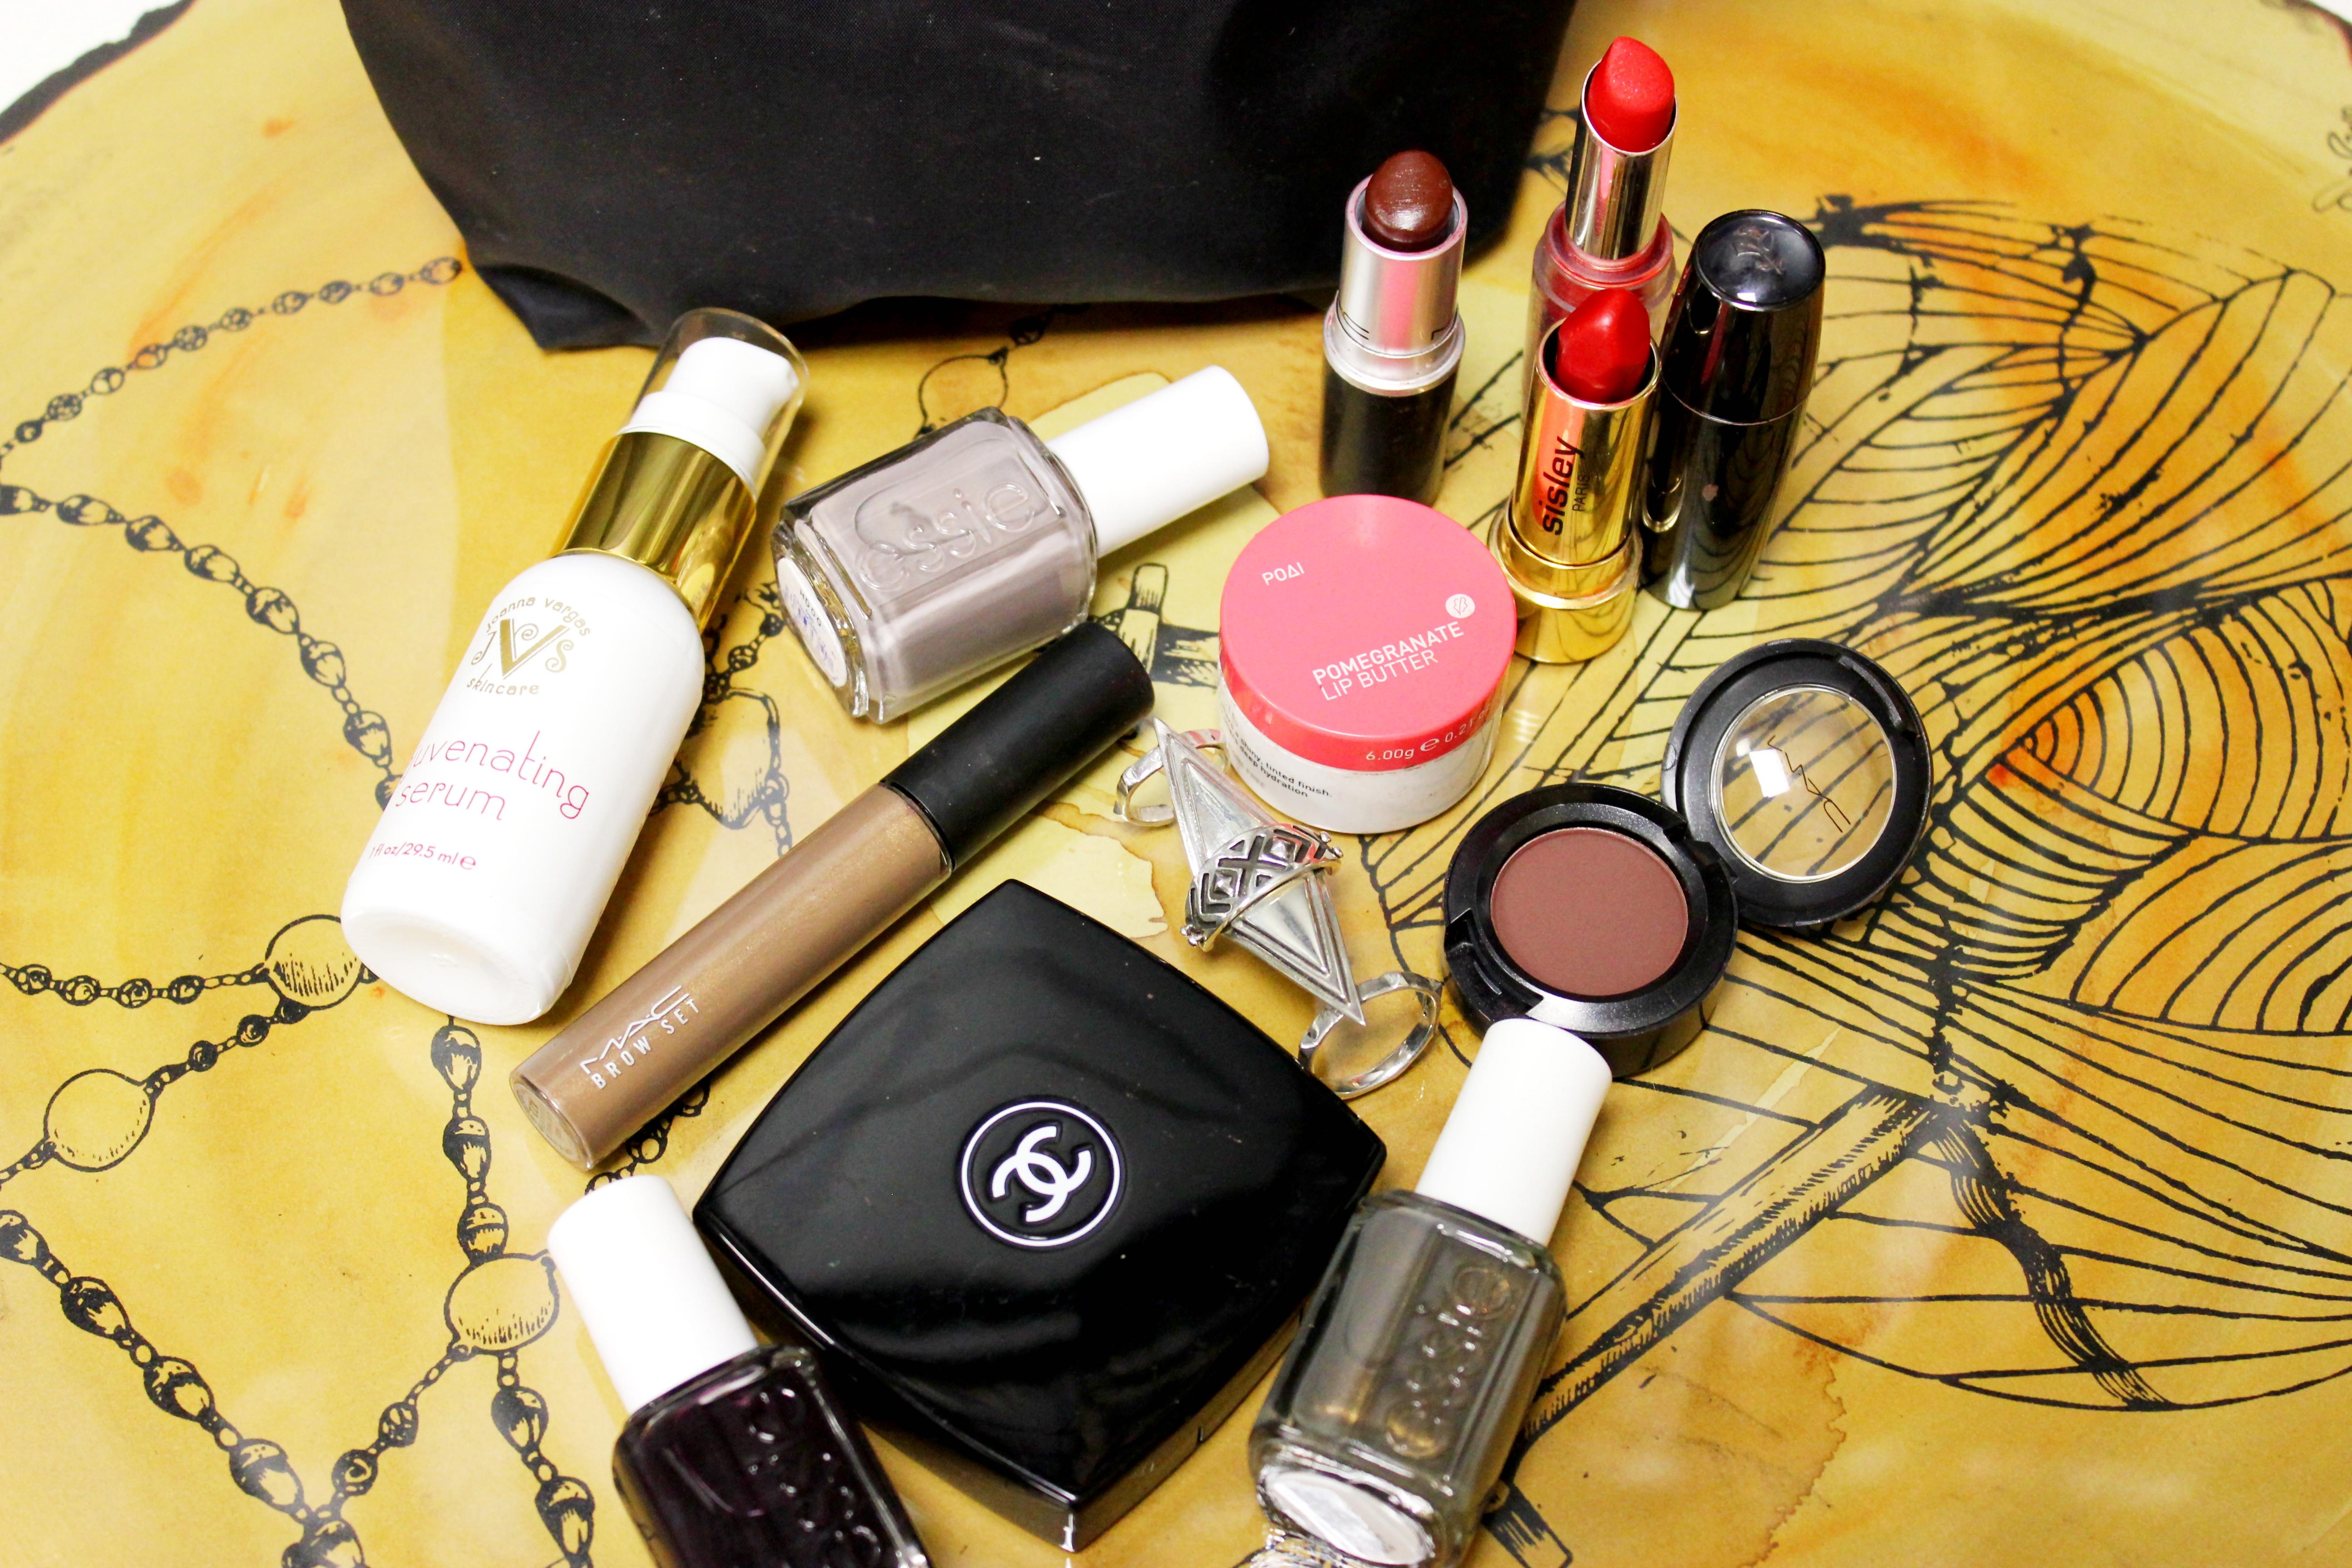 I Love Makeup Pictures Images amp Photos  Photobucket